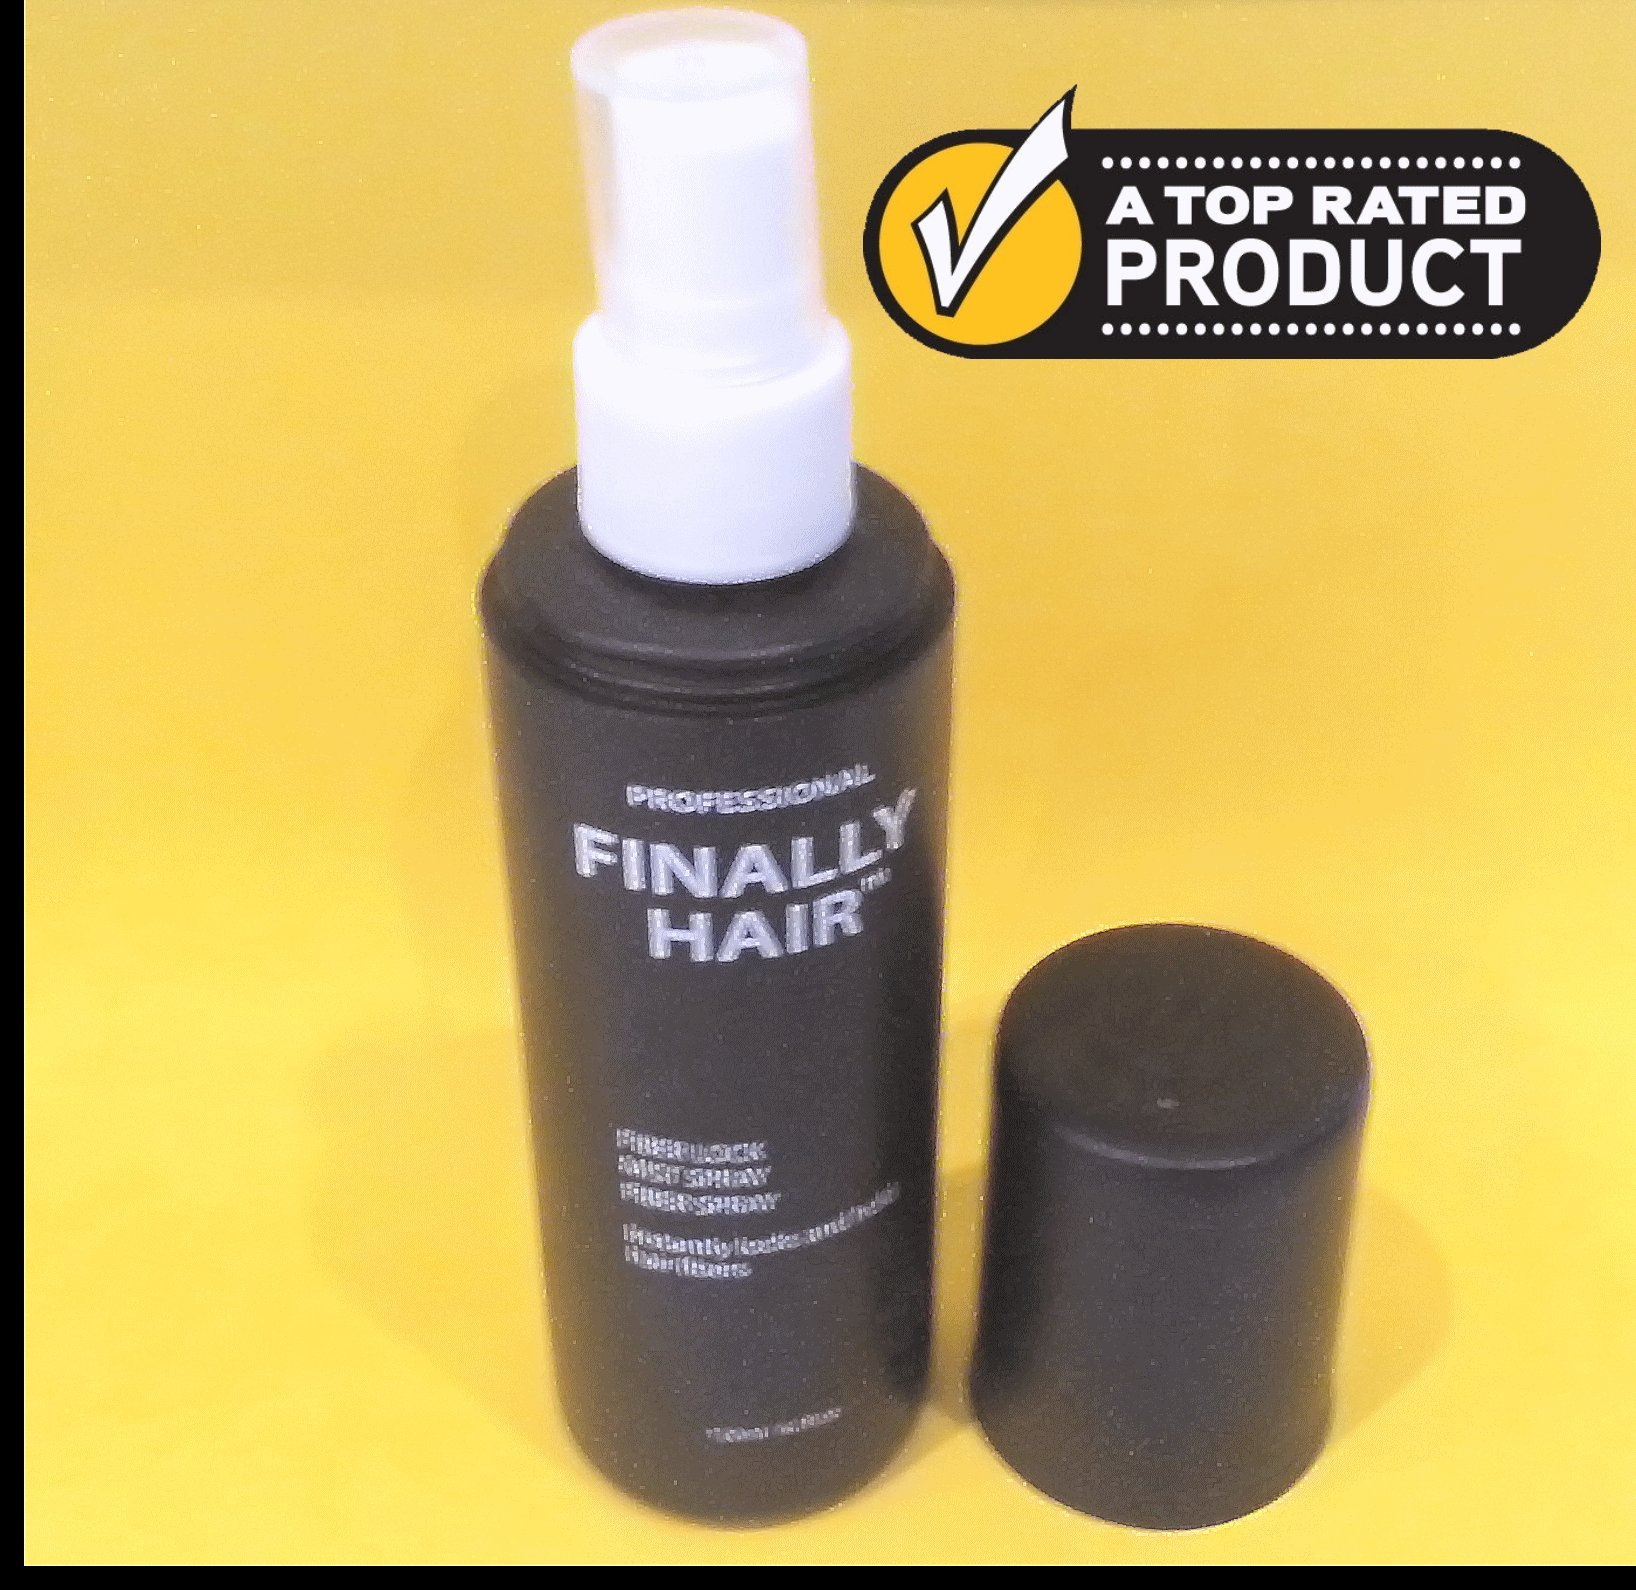 Finally Hair Spray. Fiber Lock STRONG Hold 4.1 oz. - Ideal hair spray for holding fiber in place. Use with fibers like Finally Hair, Xfusion, Strand, Finally Hair, Bosley, Nanogen, Viviscal, & others.